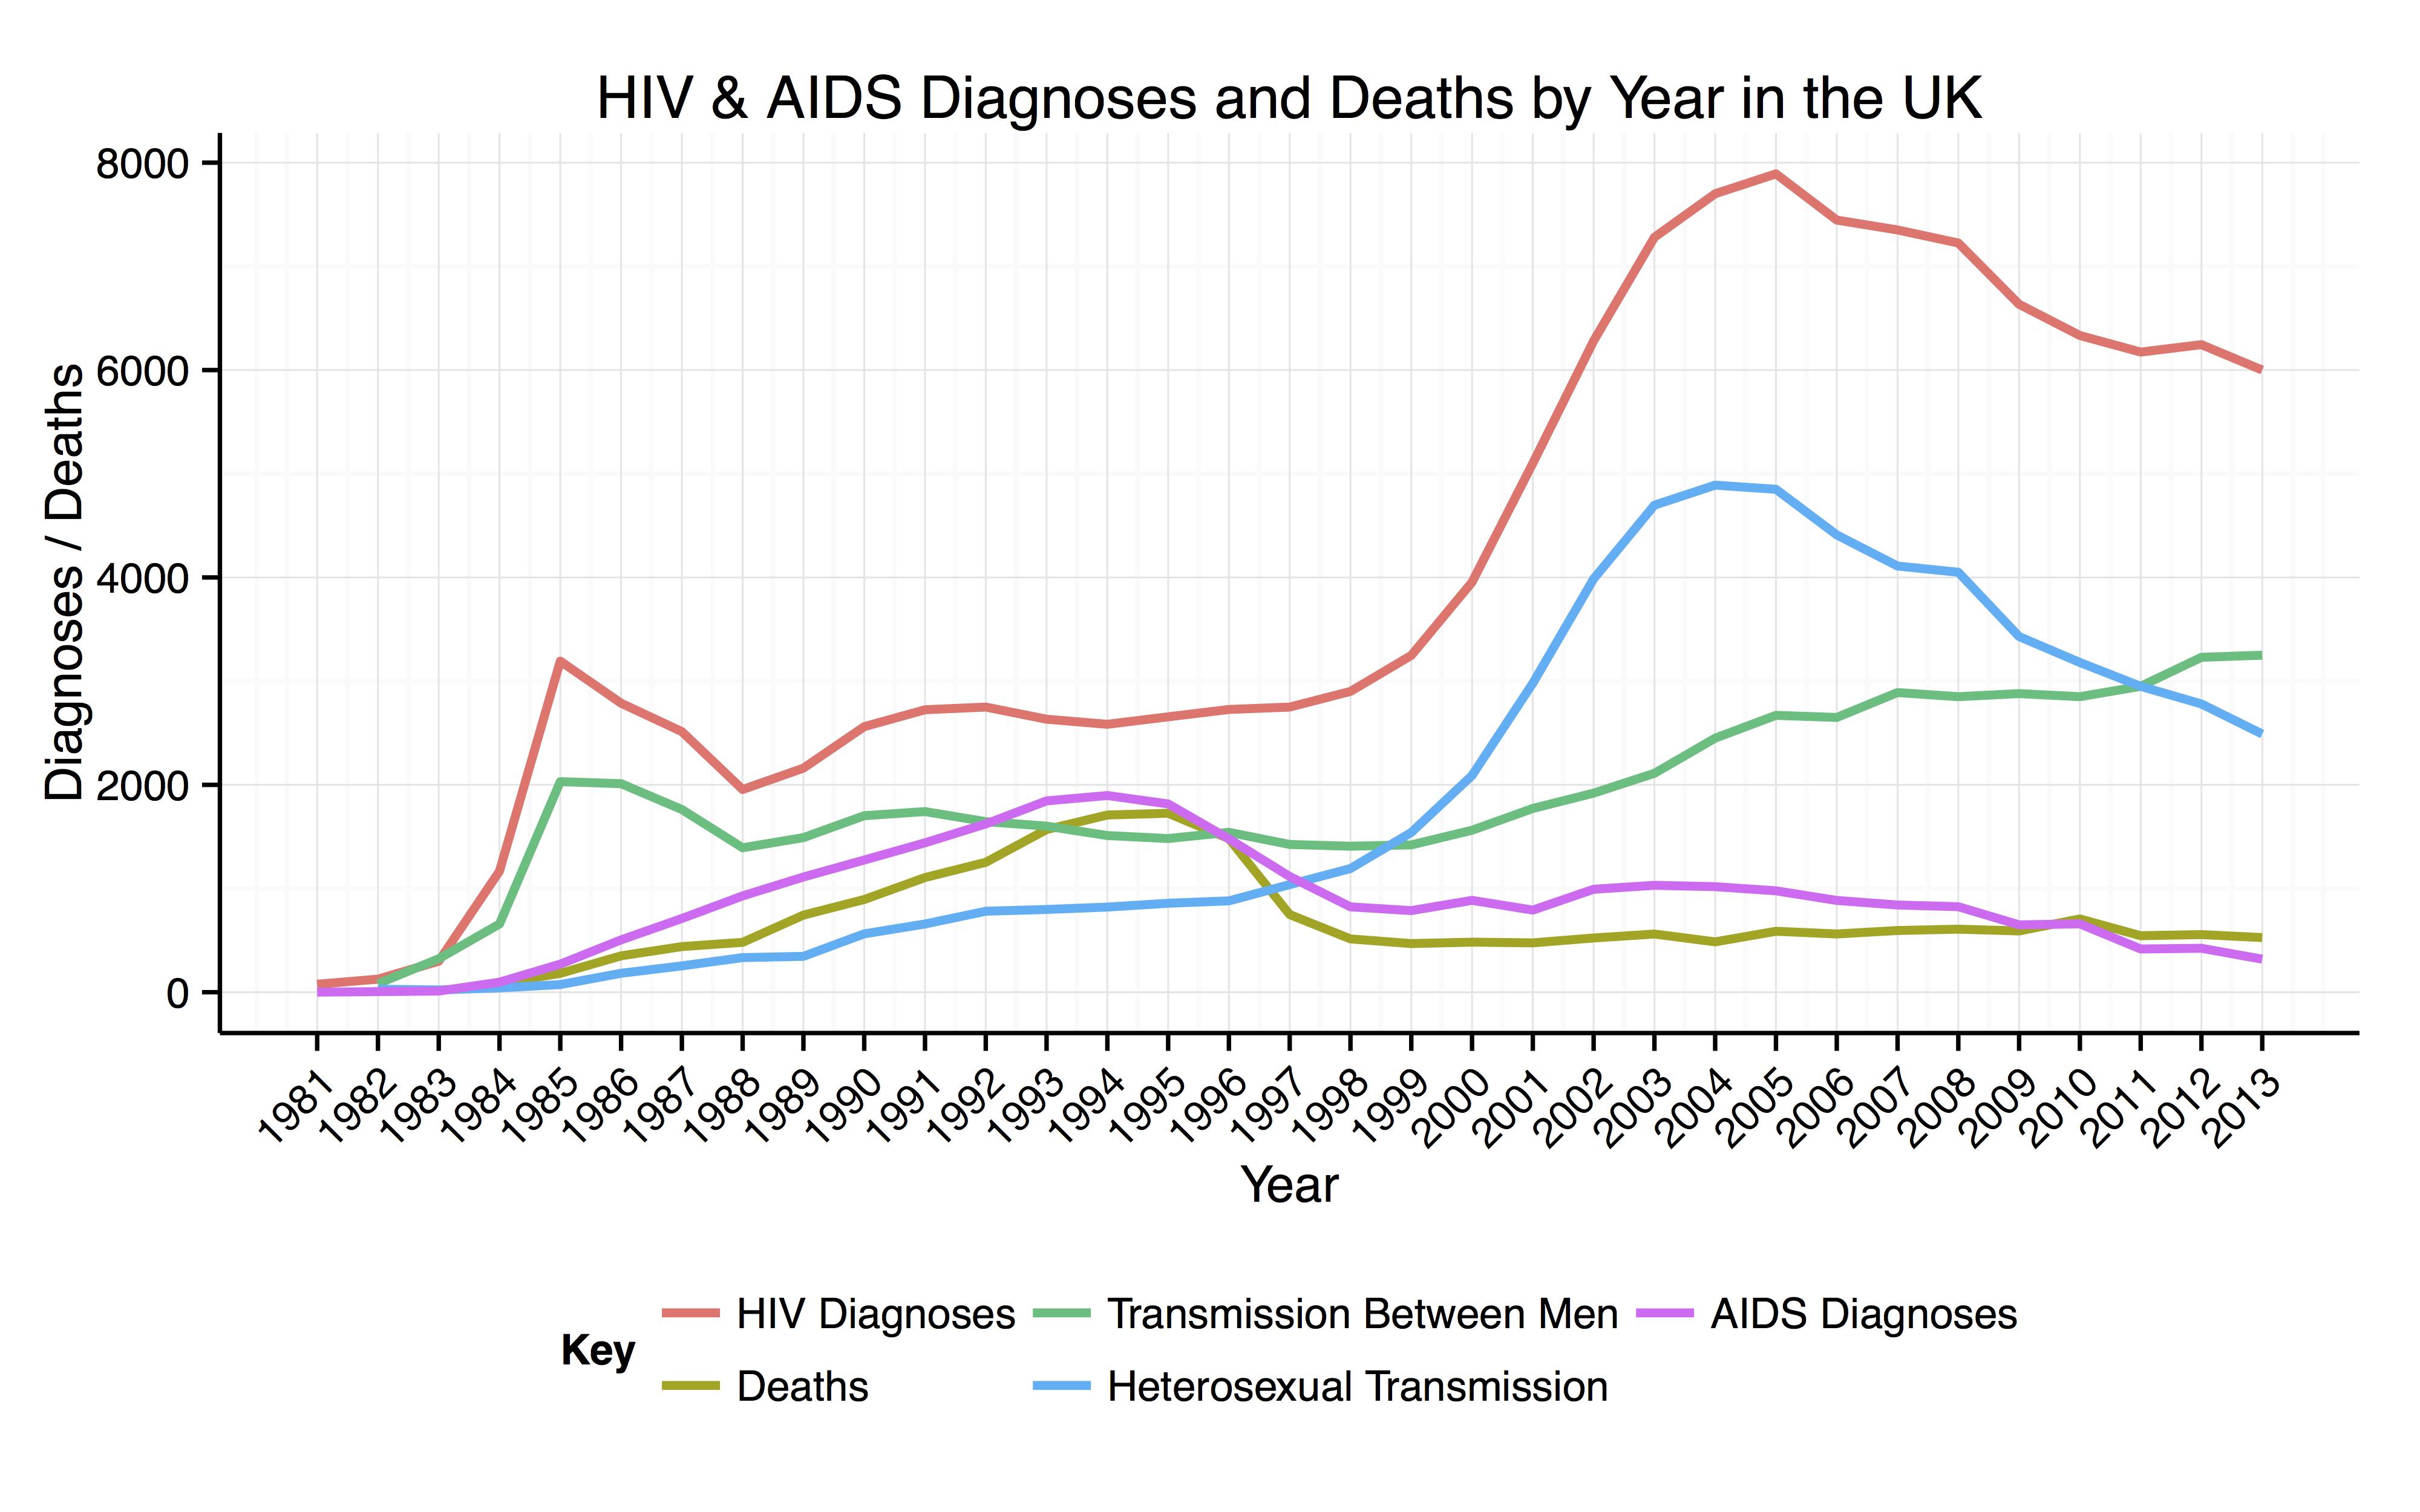 HIV/AIDS in the United Kingdom.